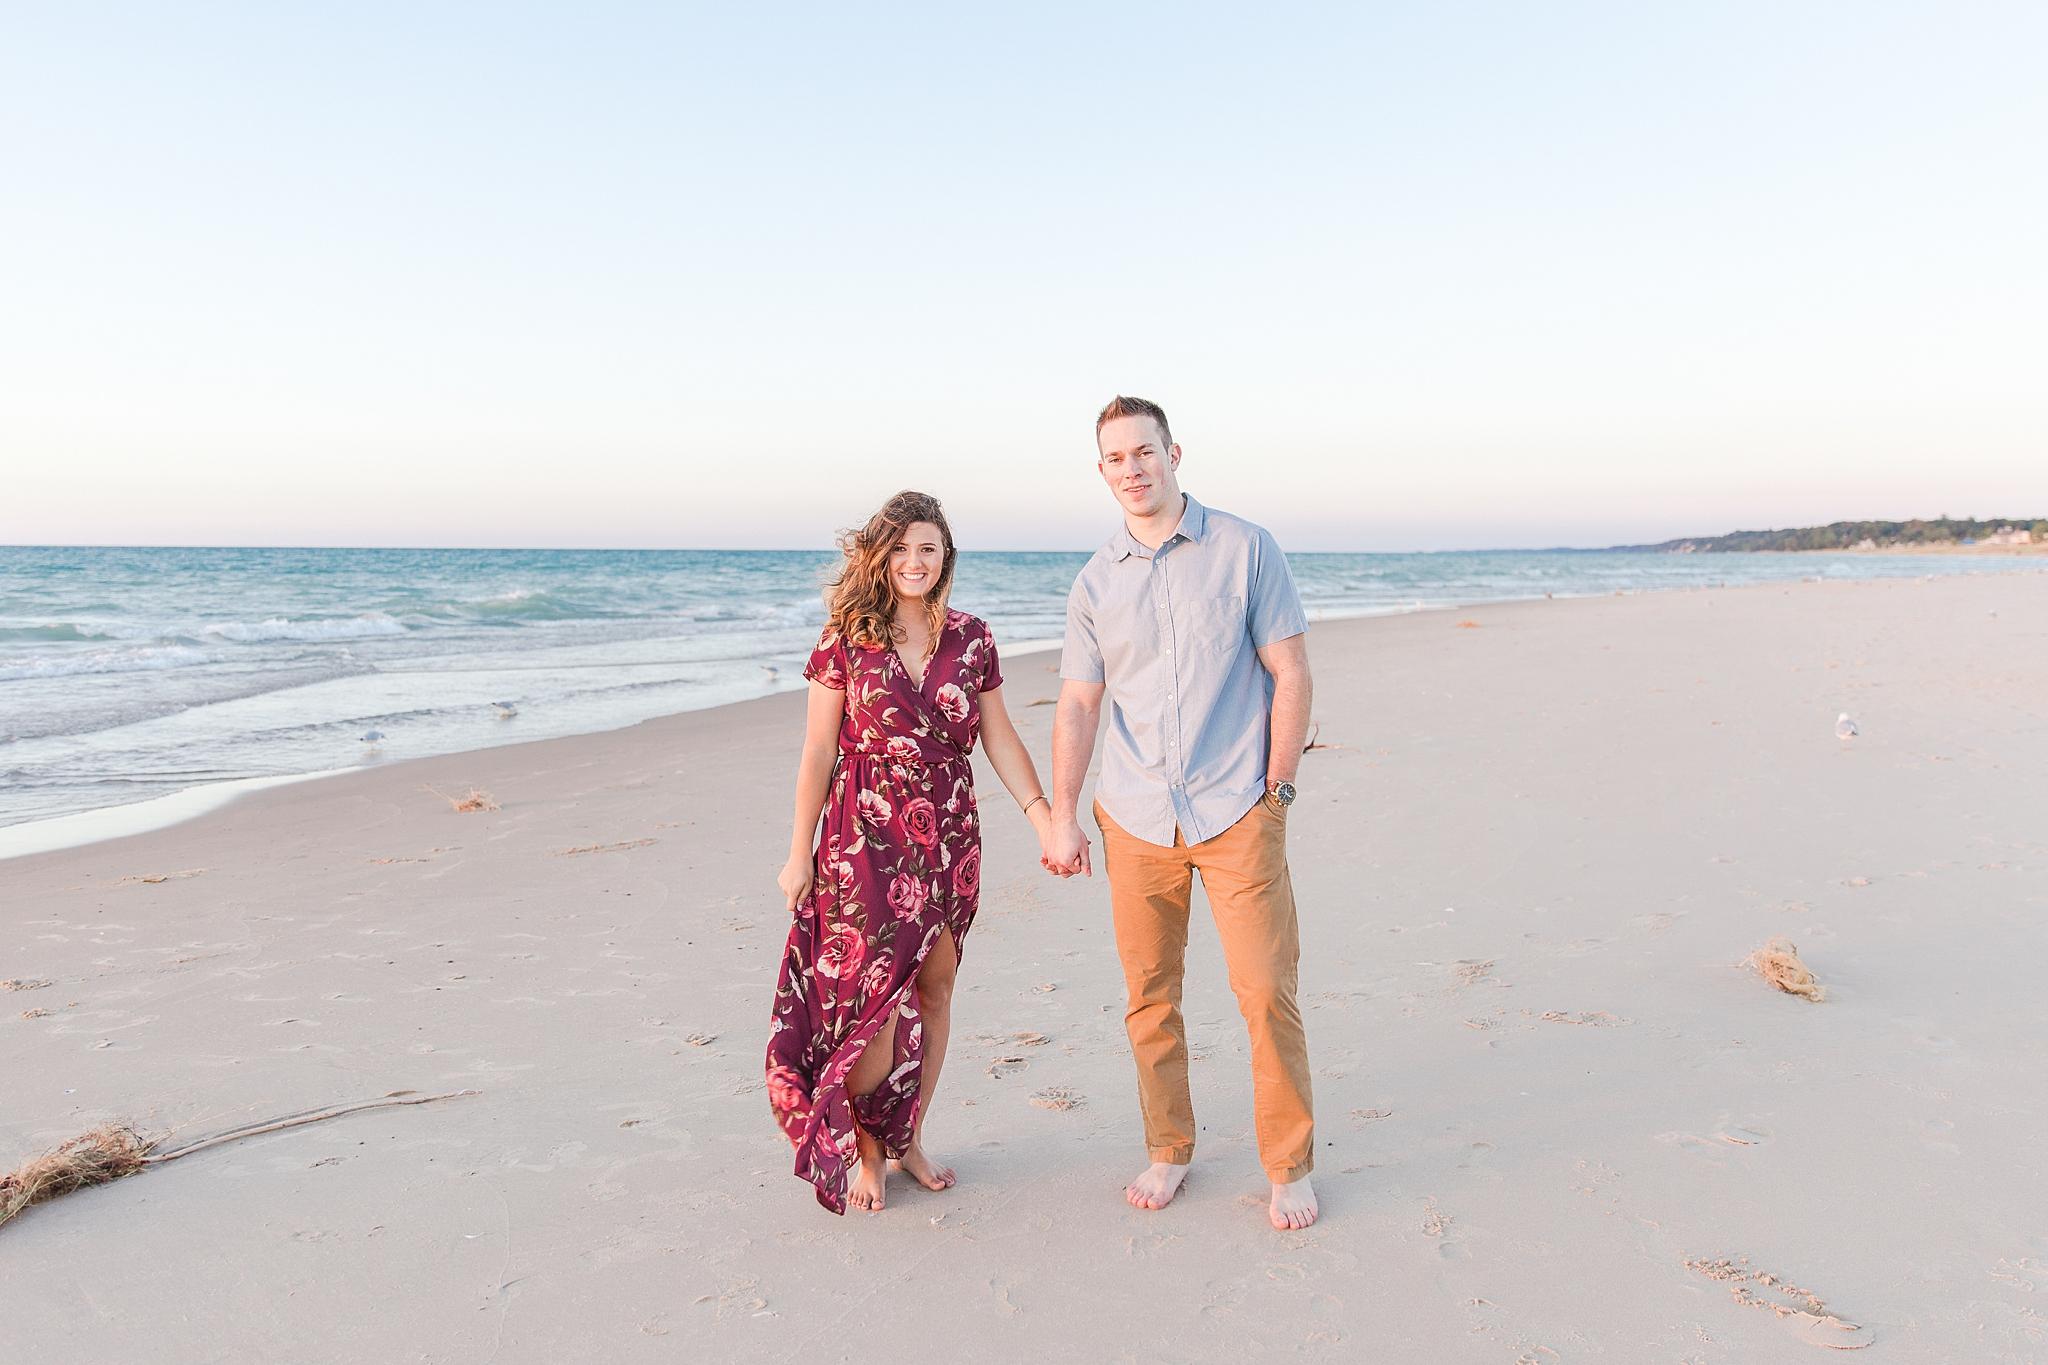 romantic--summer-beach-engagement-photography-in-st-joseph-mi-by-courtney-carolyn-photography_0016.jpg